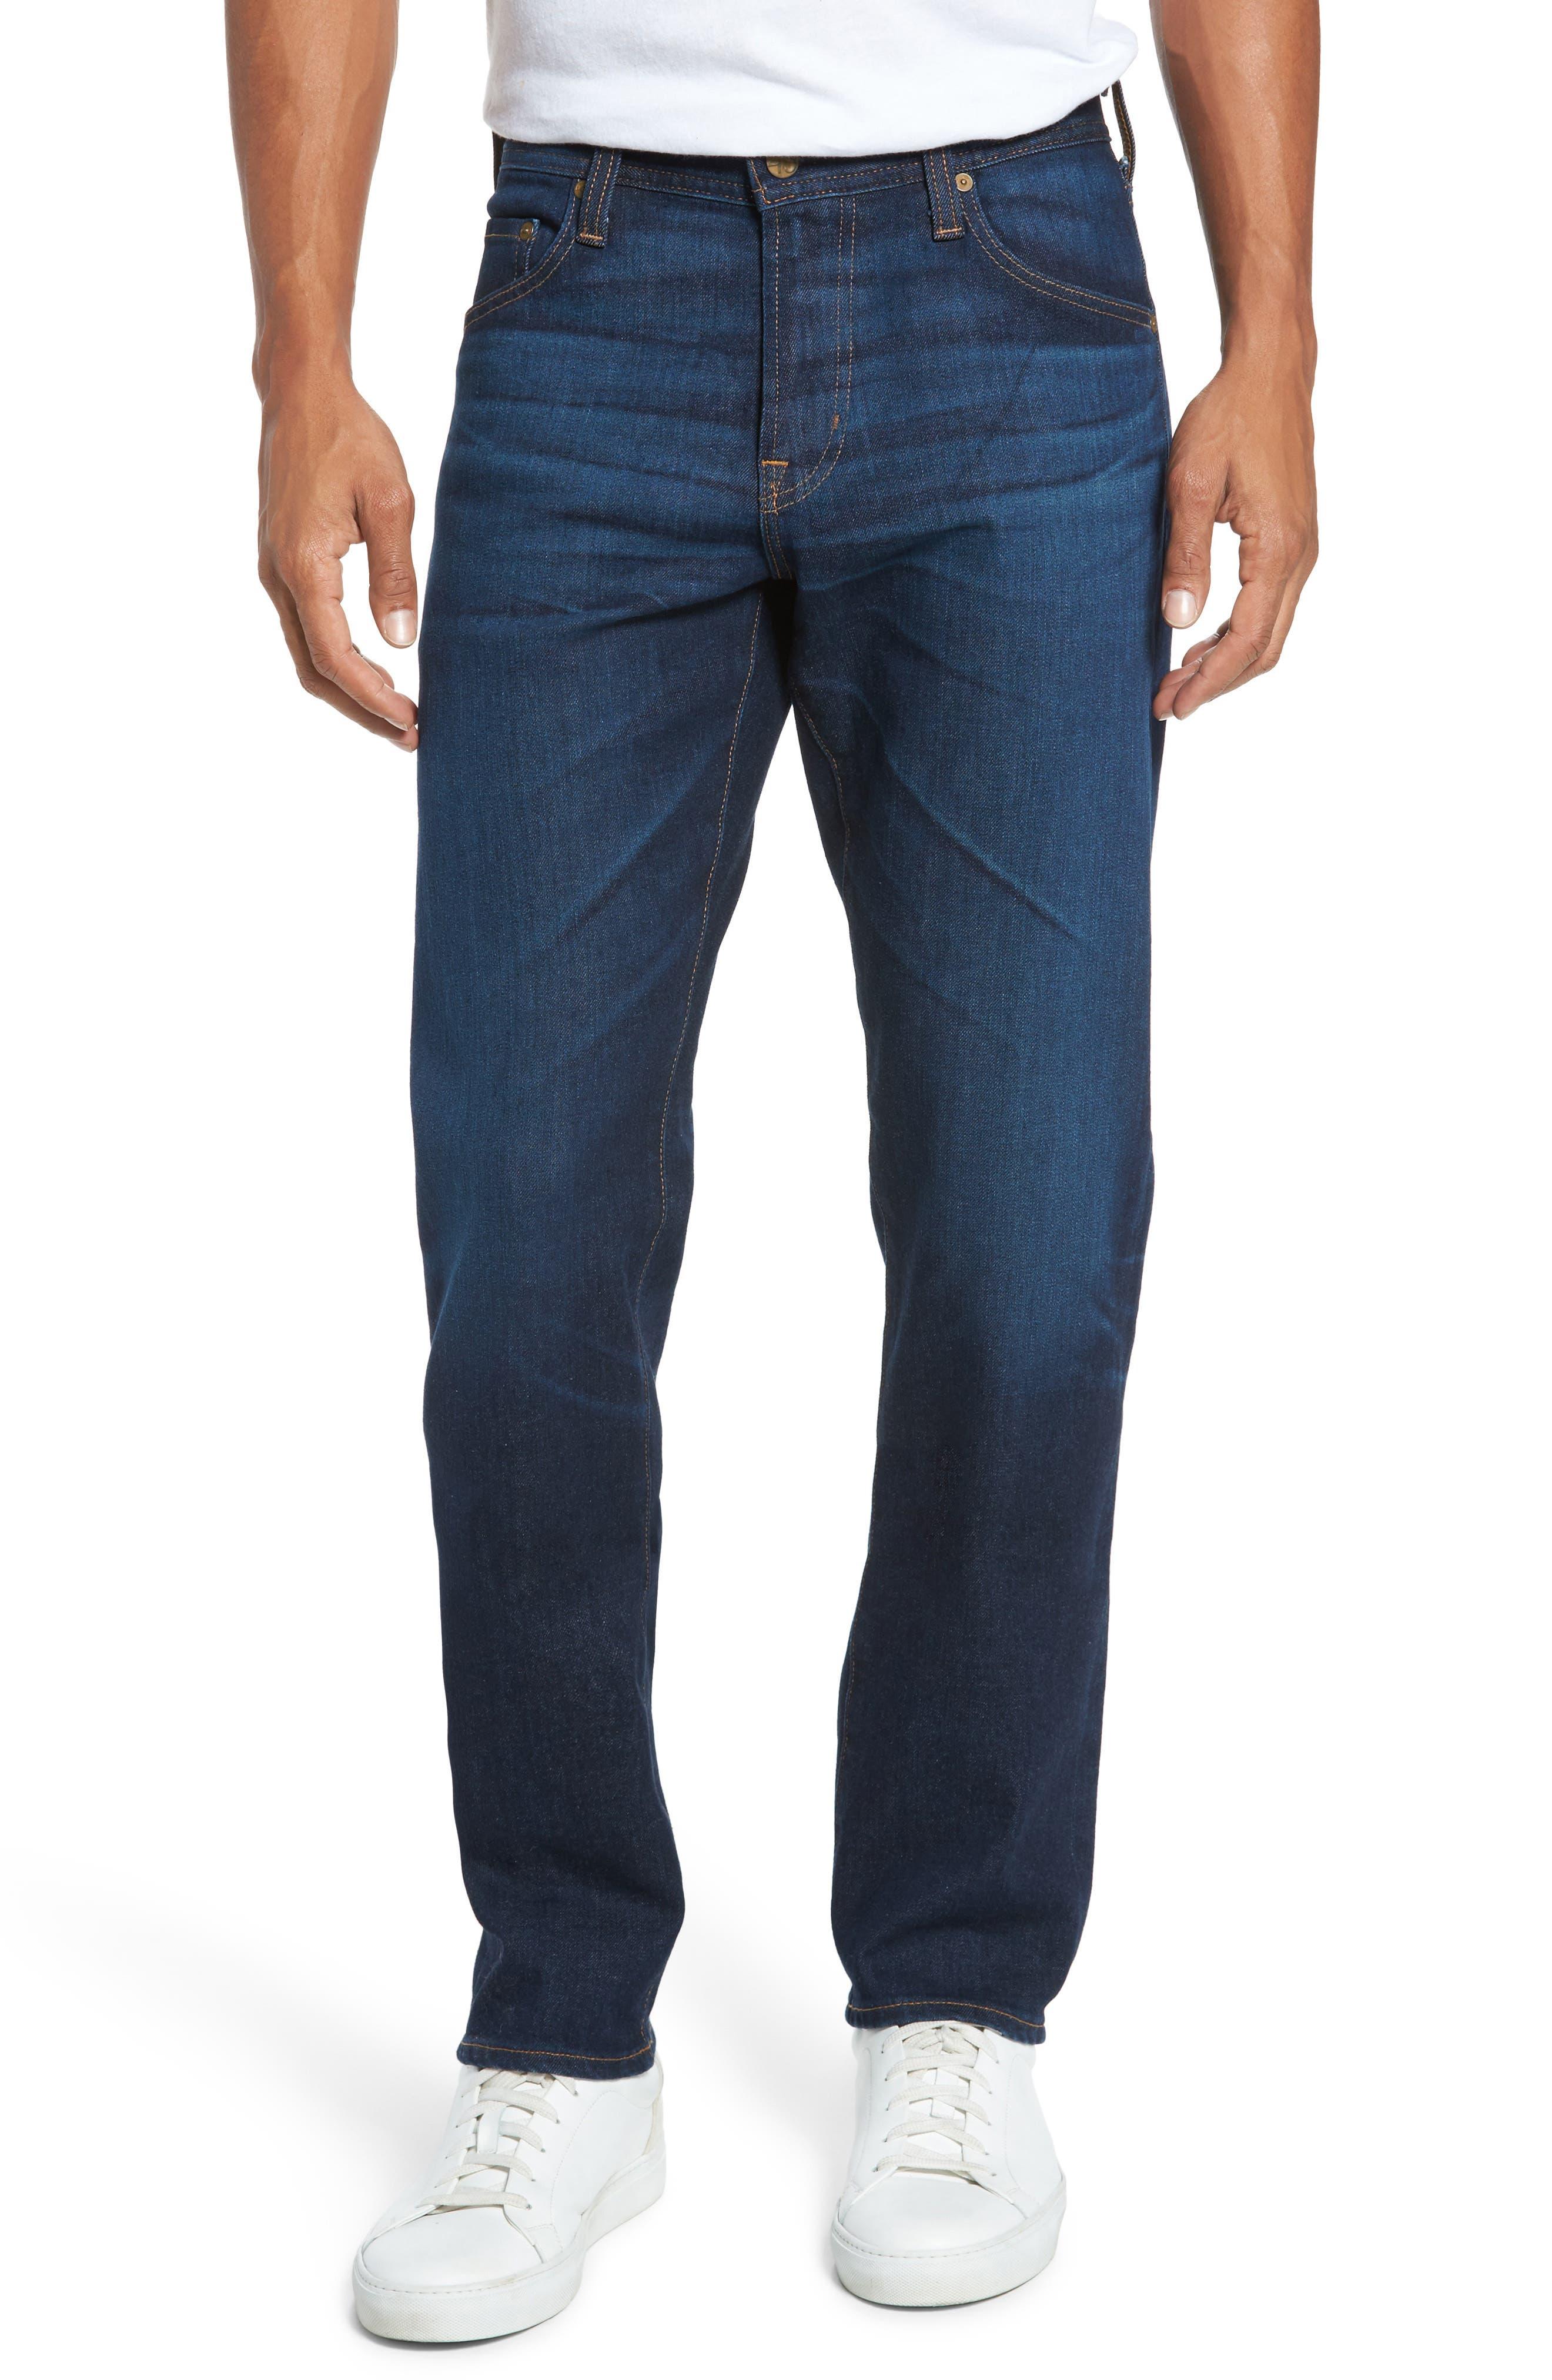 Graduate Slim Straight Fit Jeans,                         Main,                         color,